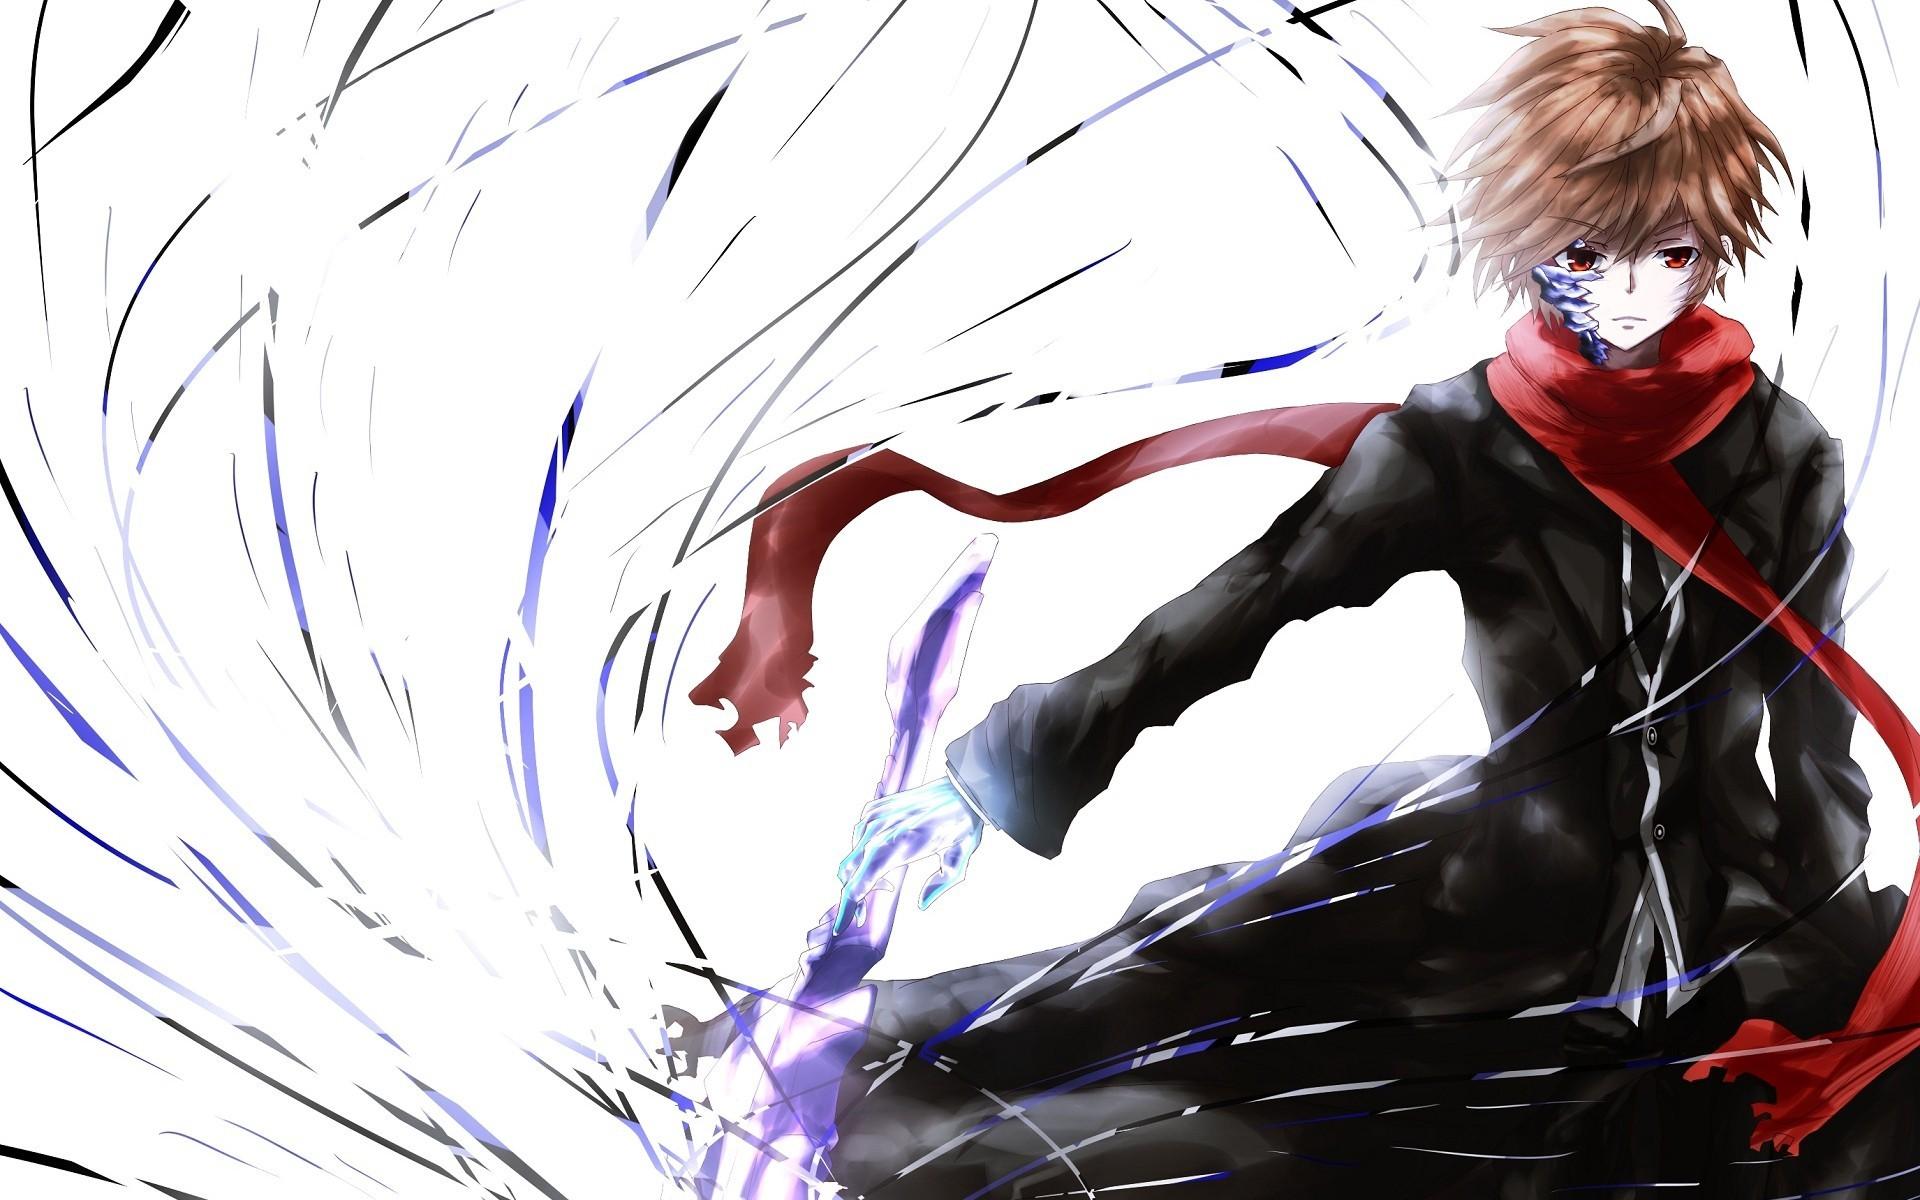 cool anime hd wallpaper #4